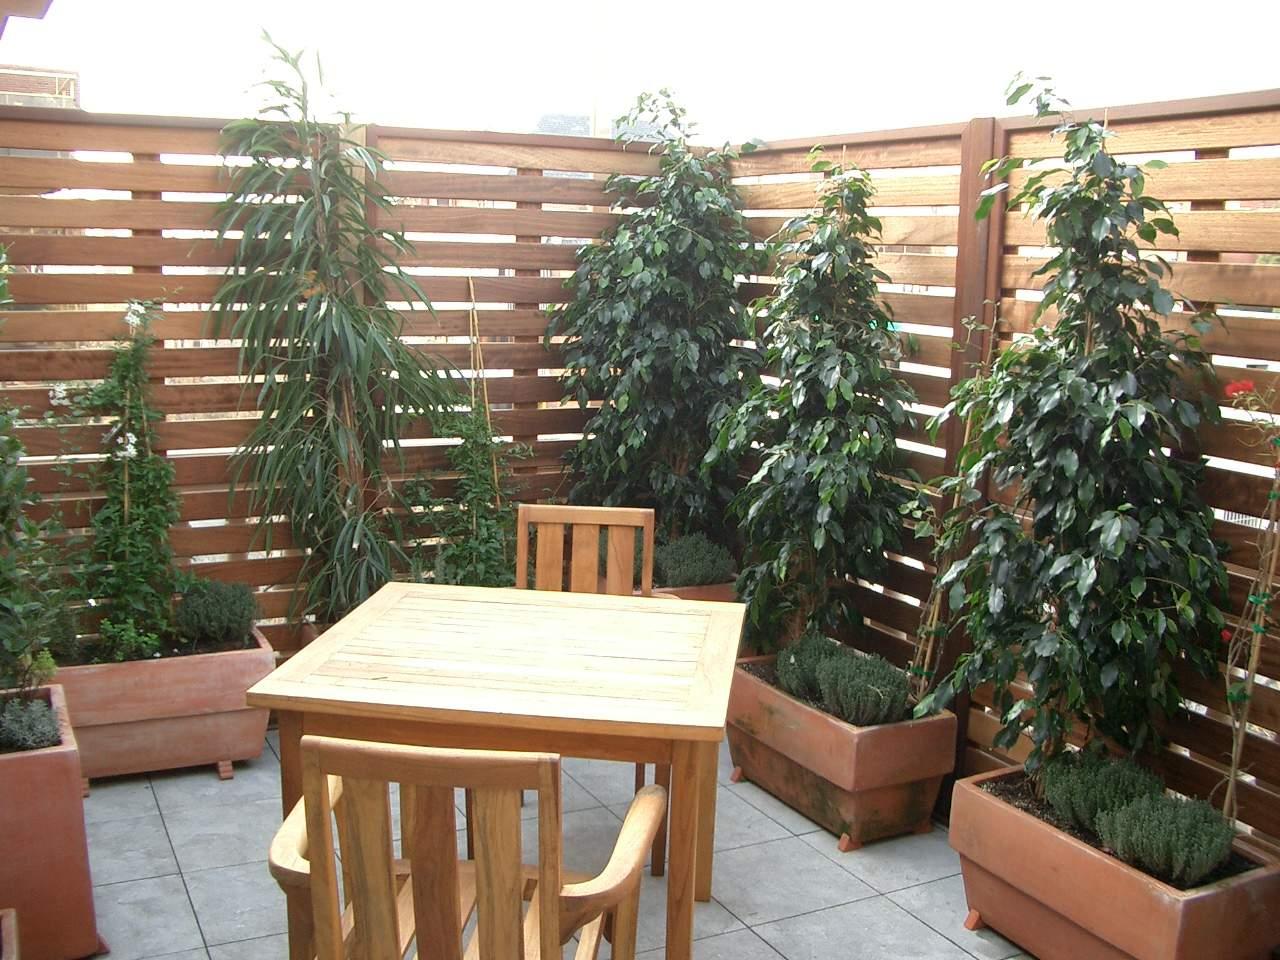 Madera para exterior landshaft empresa de paisajismo for Celosia de madera para jardin